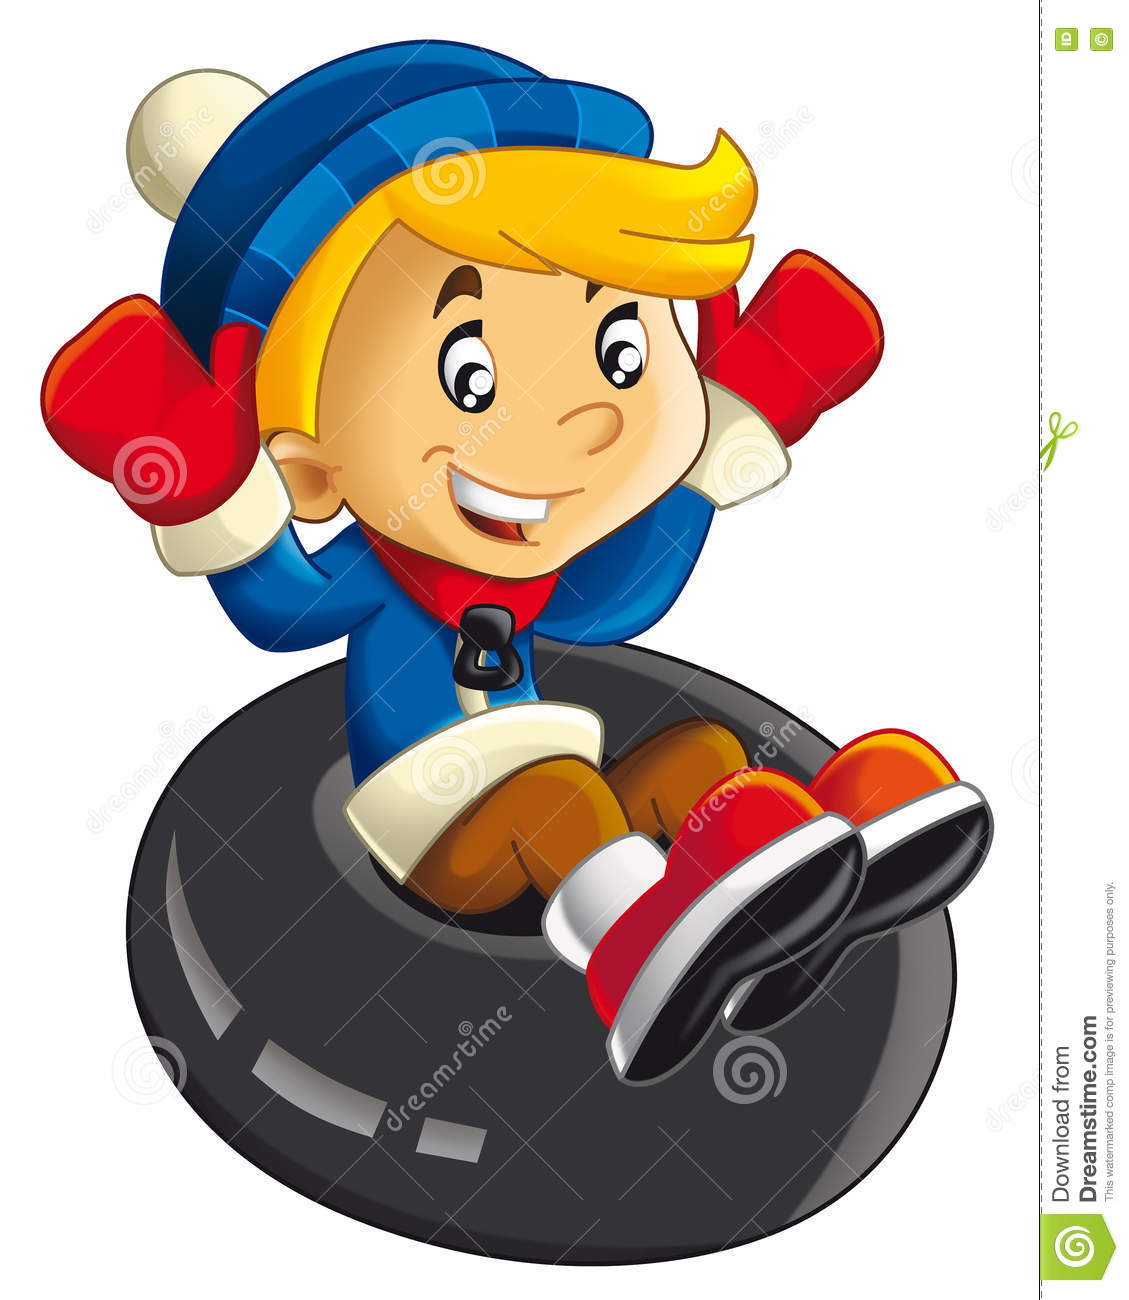 Cartoon Child Sliding Down On The Tube.